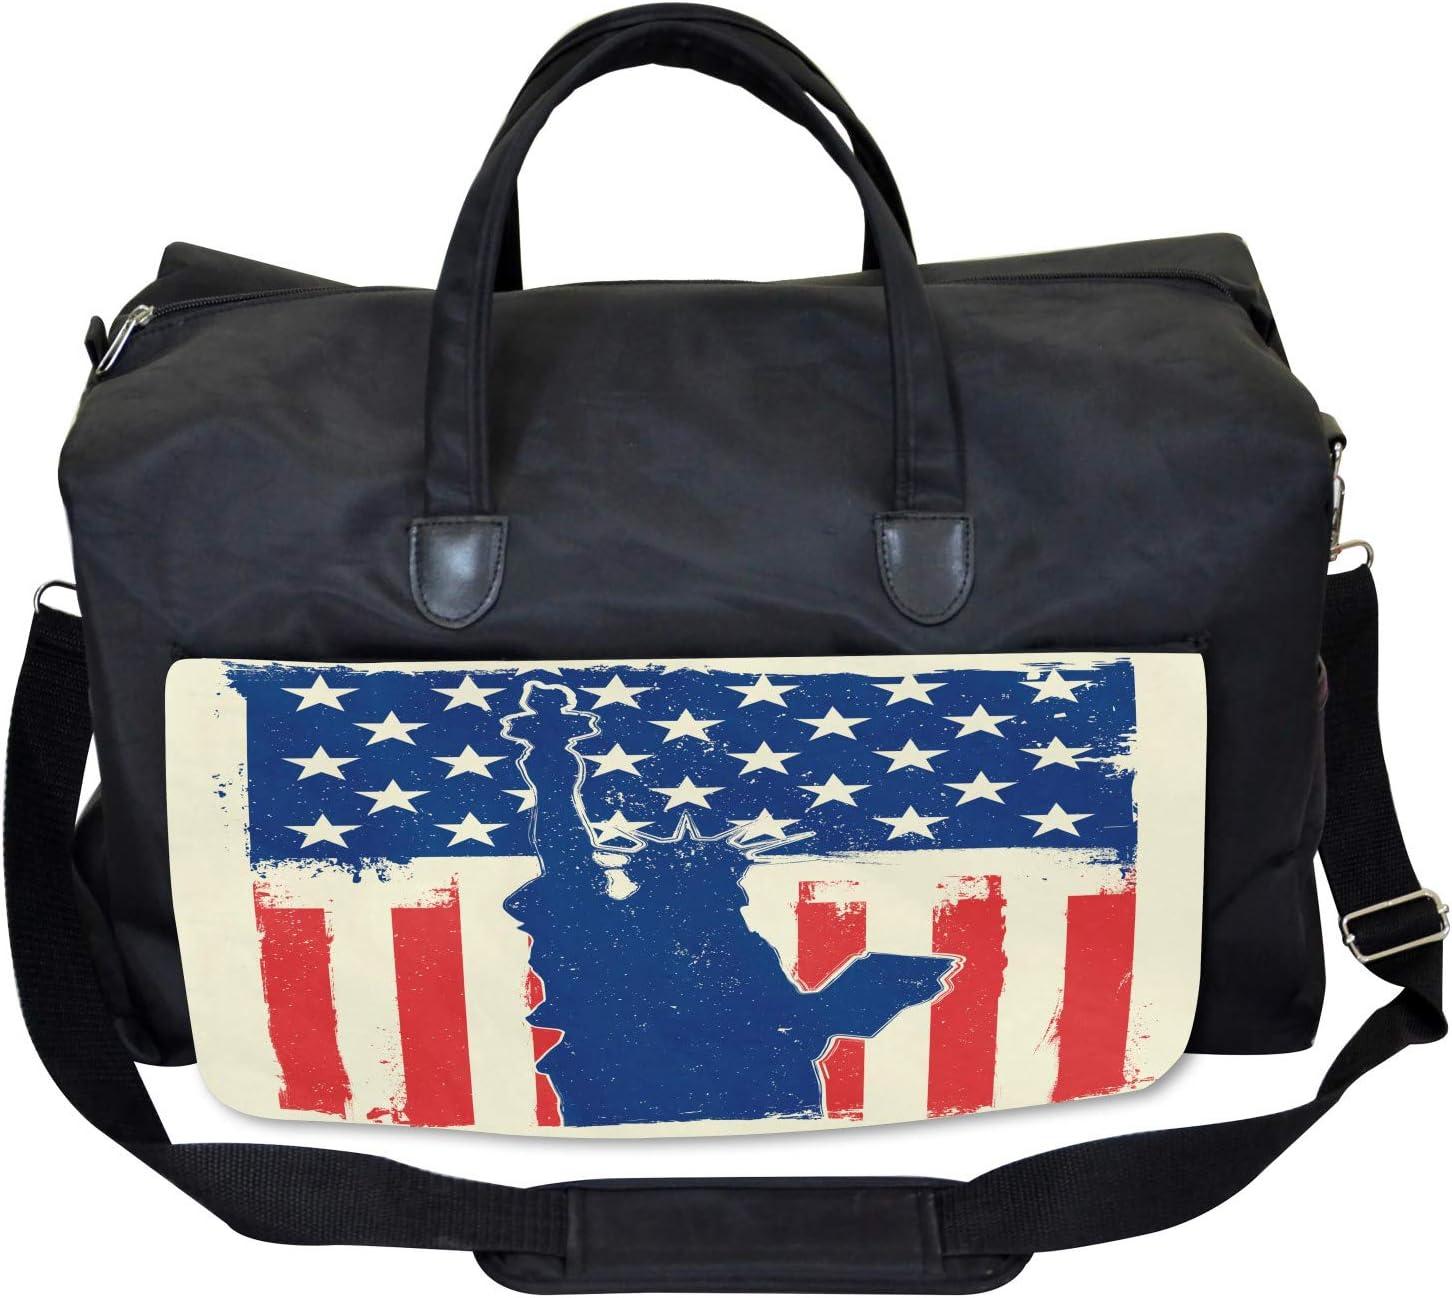 Ambesonne 4th of July Gym Bag Grunge Flag Design Large Weekender Carry-on